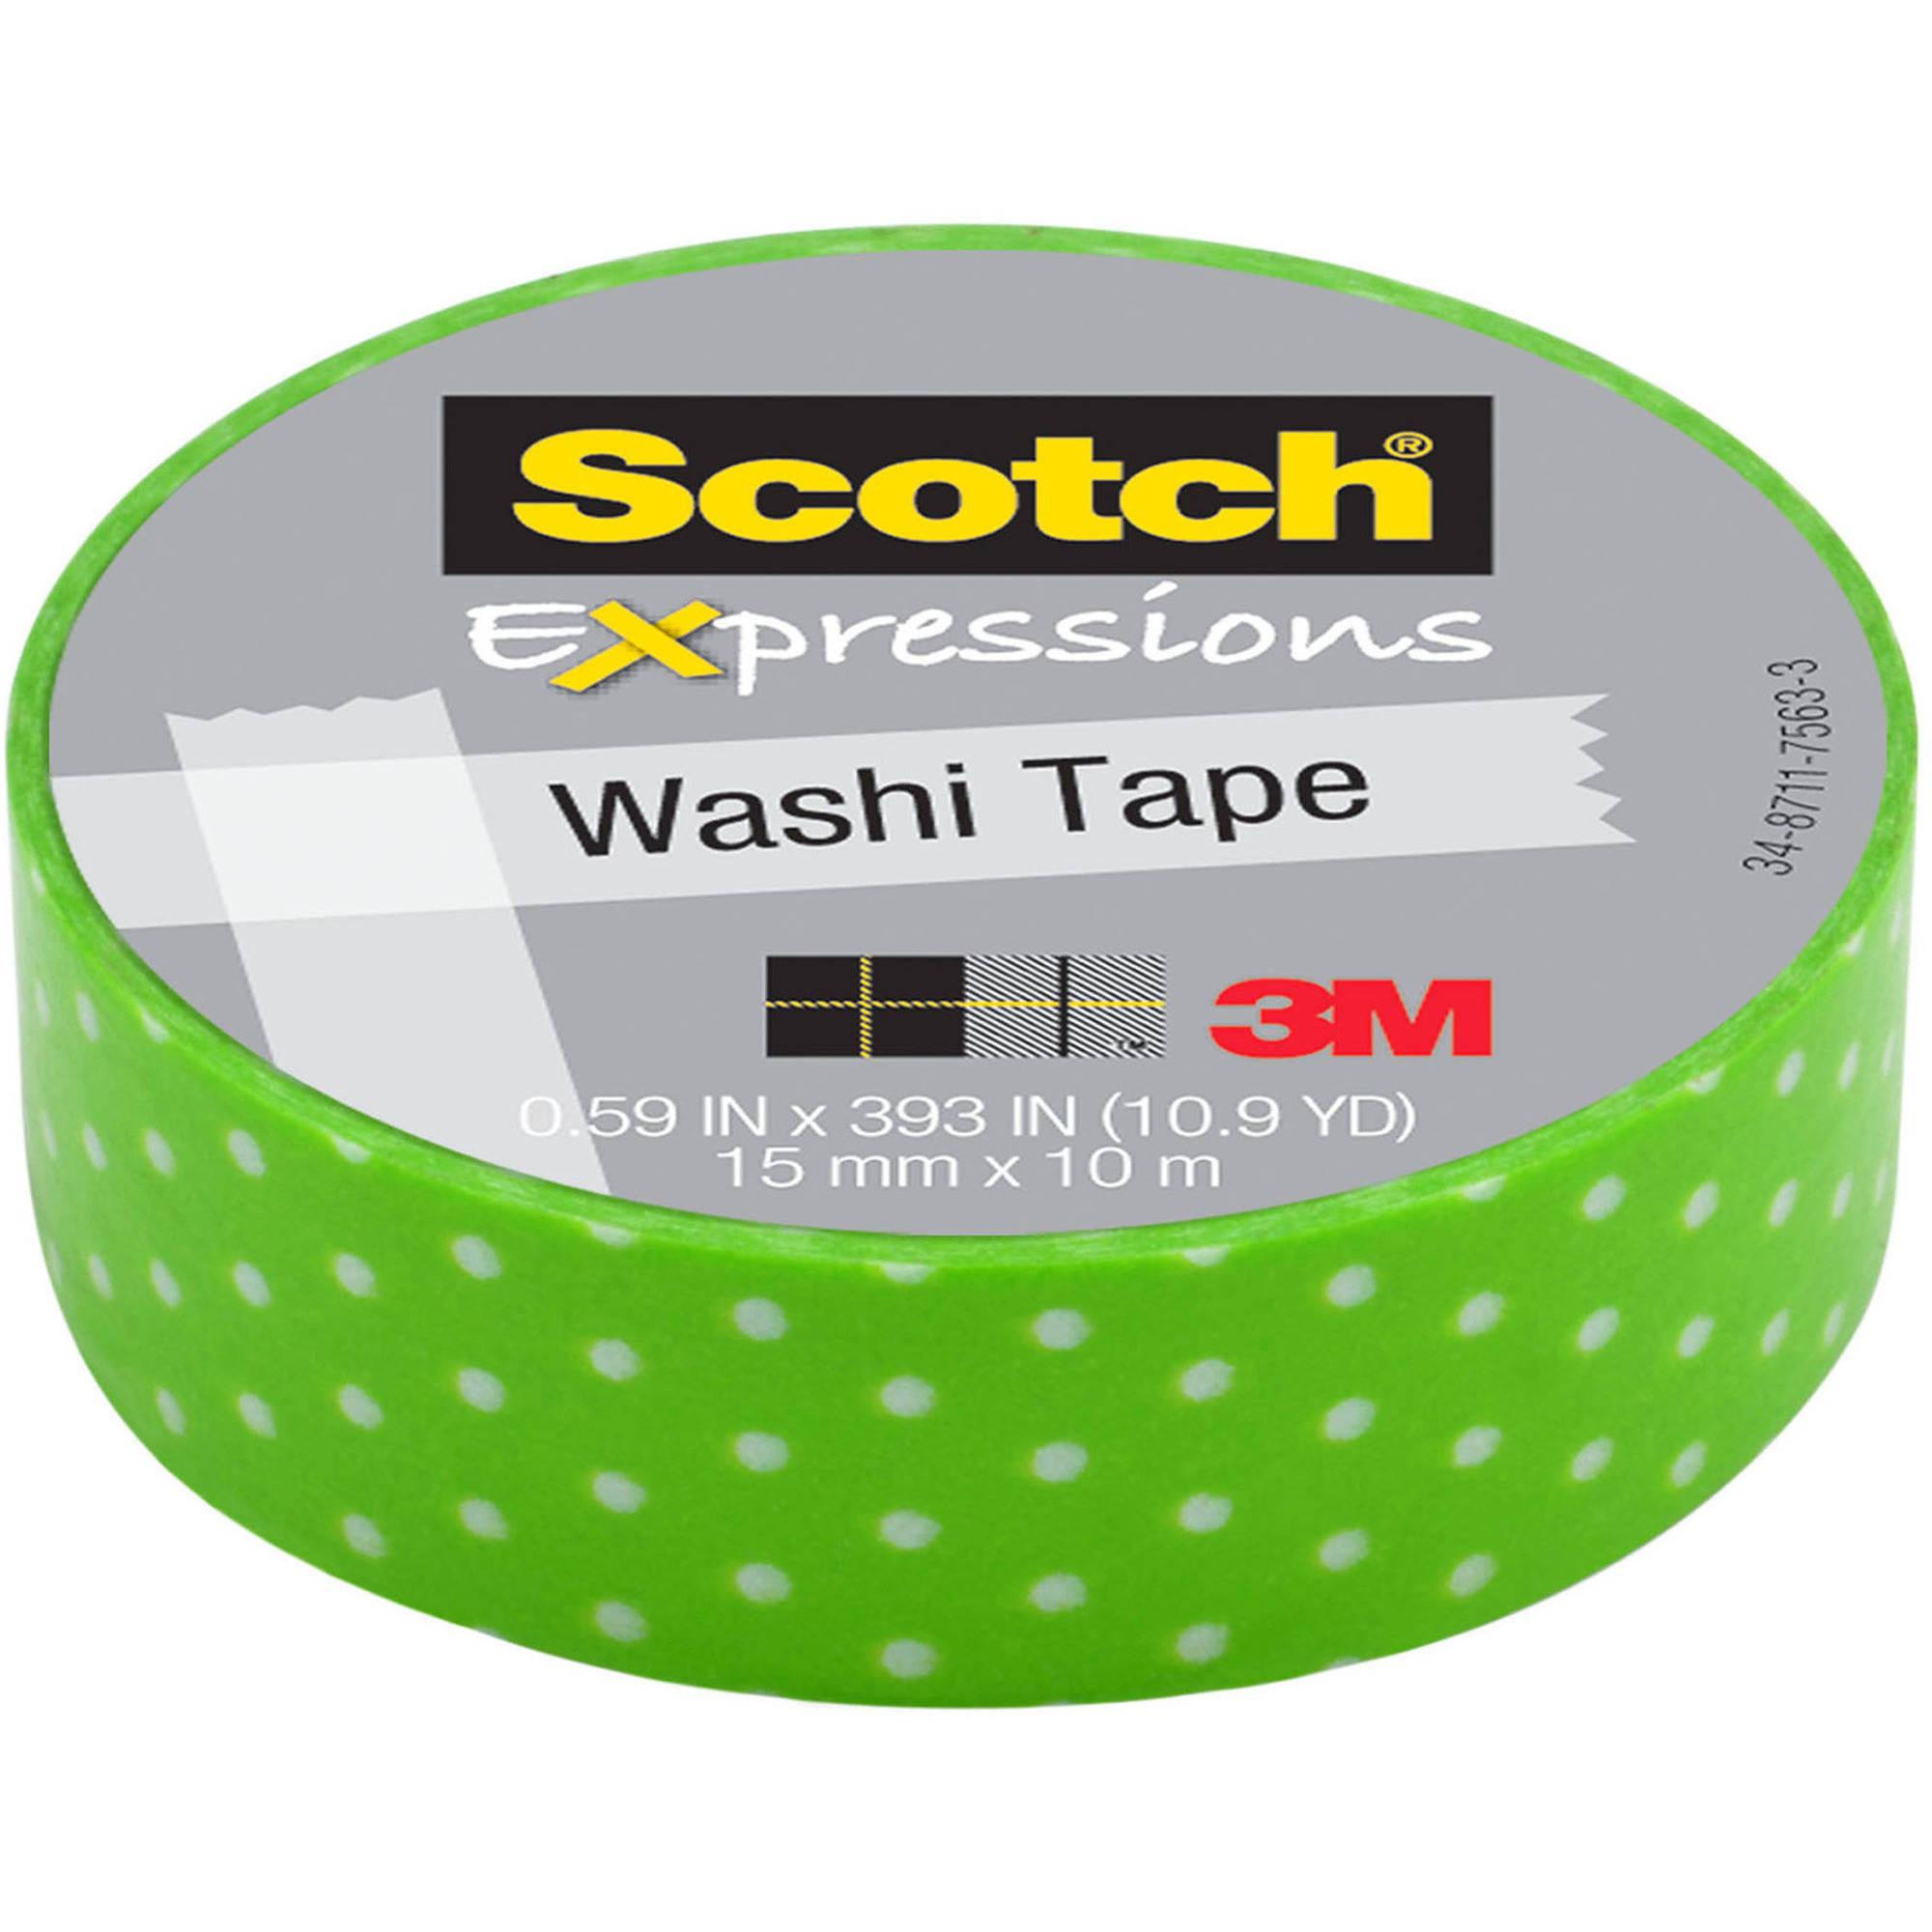 "Scotch Expressions Washi Tape, .59"" x 393"", Green/White Swiss Dot"